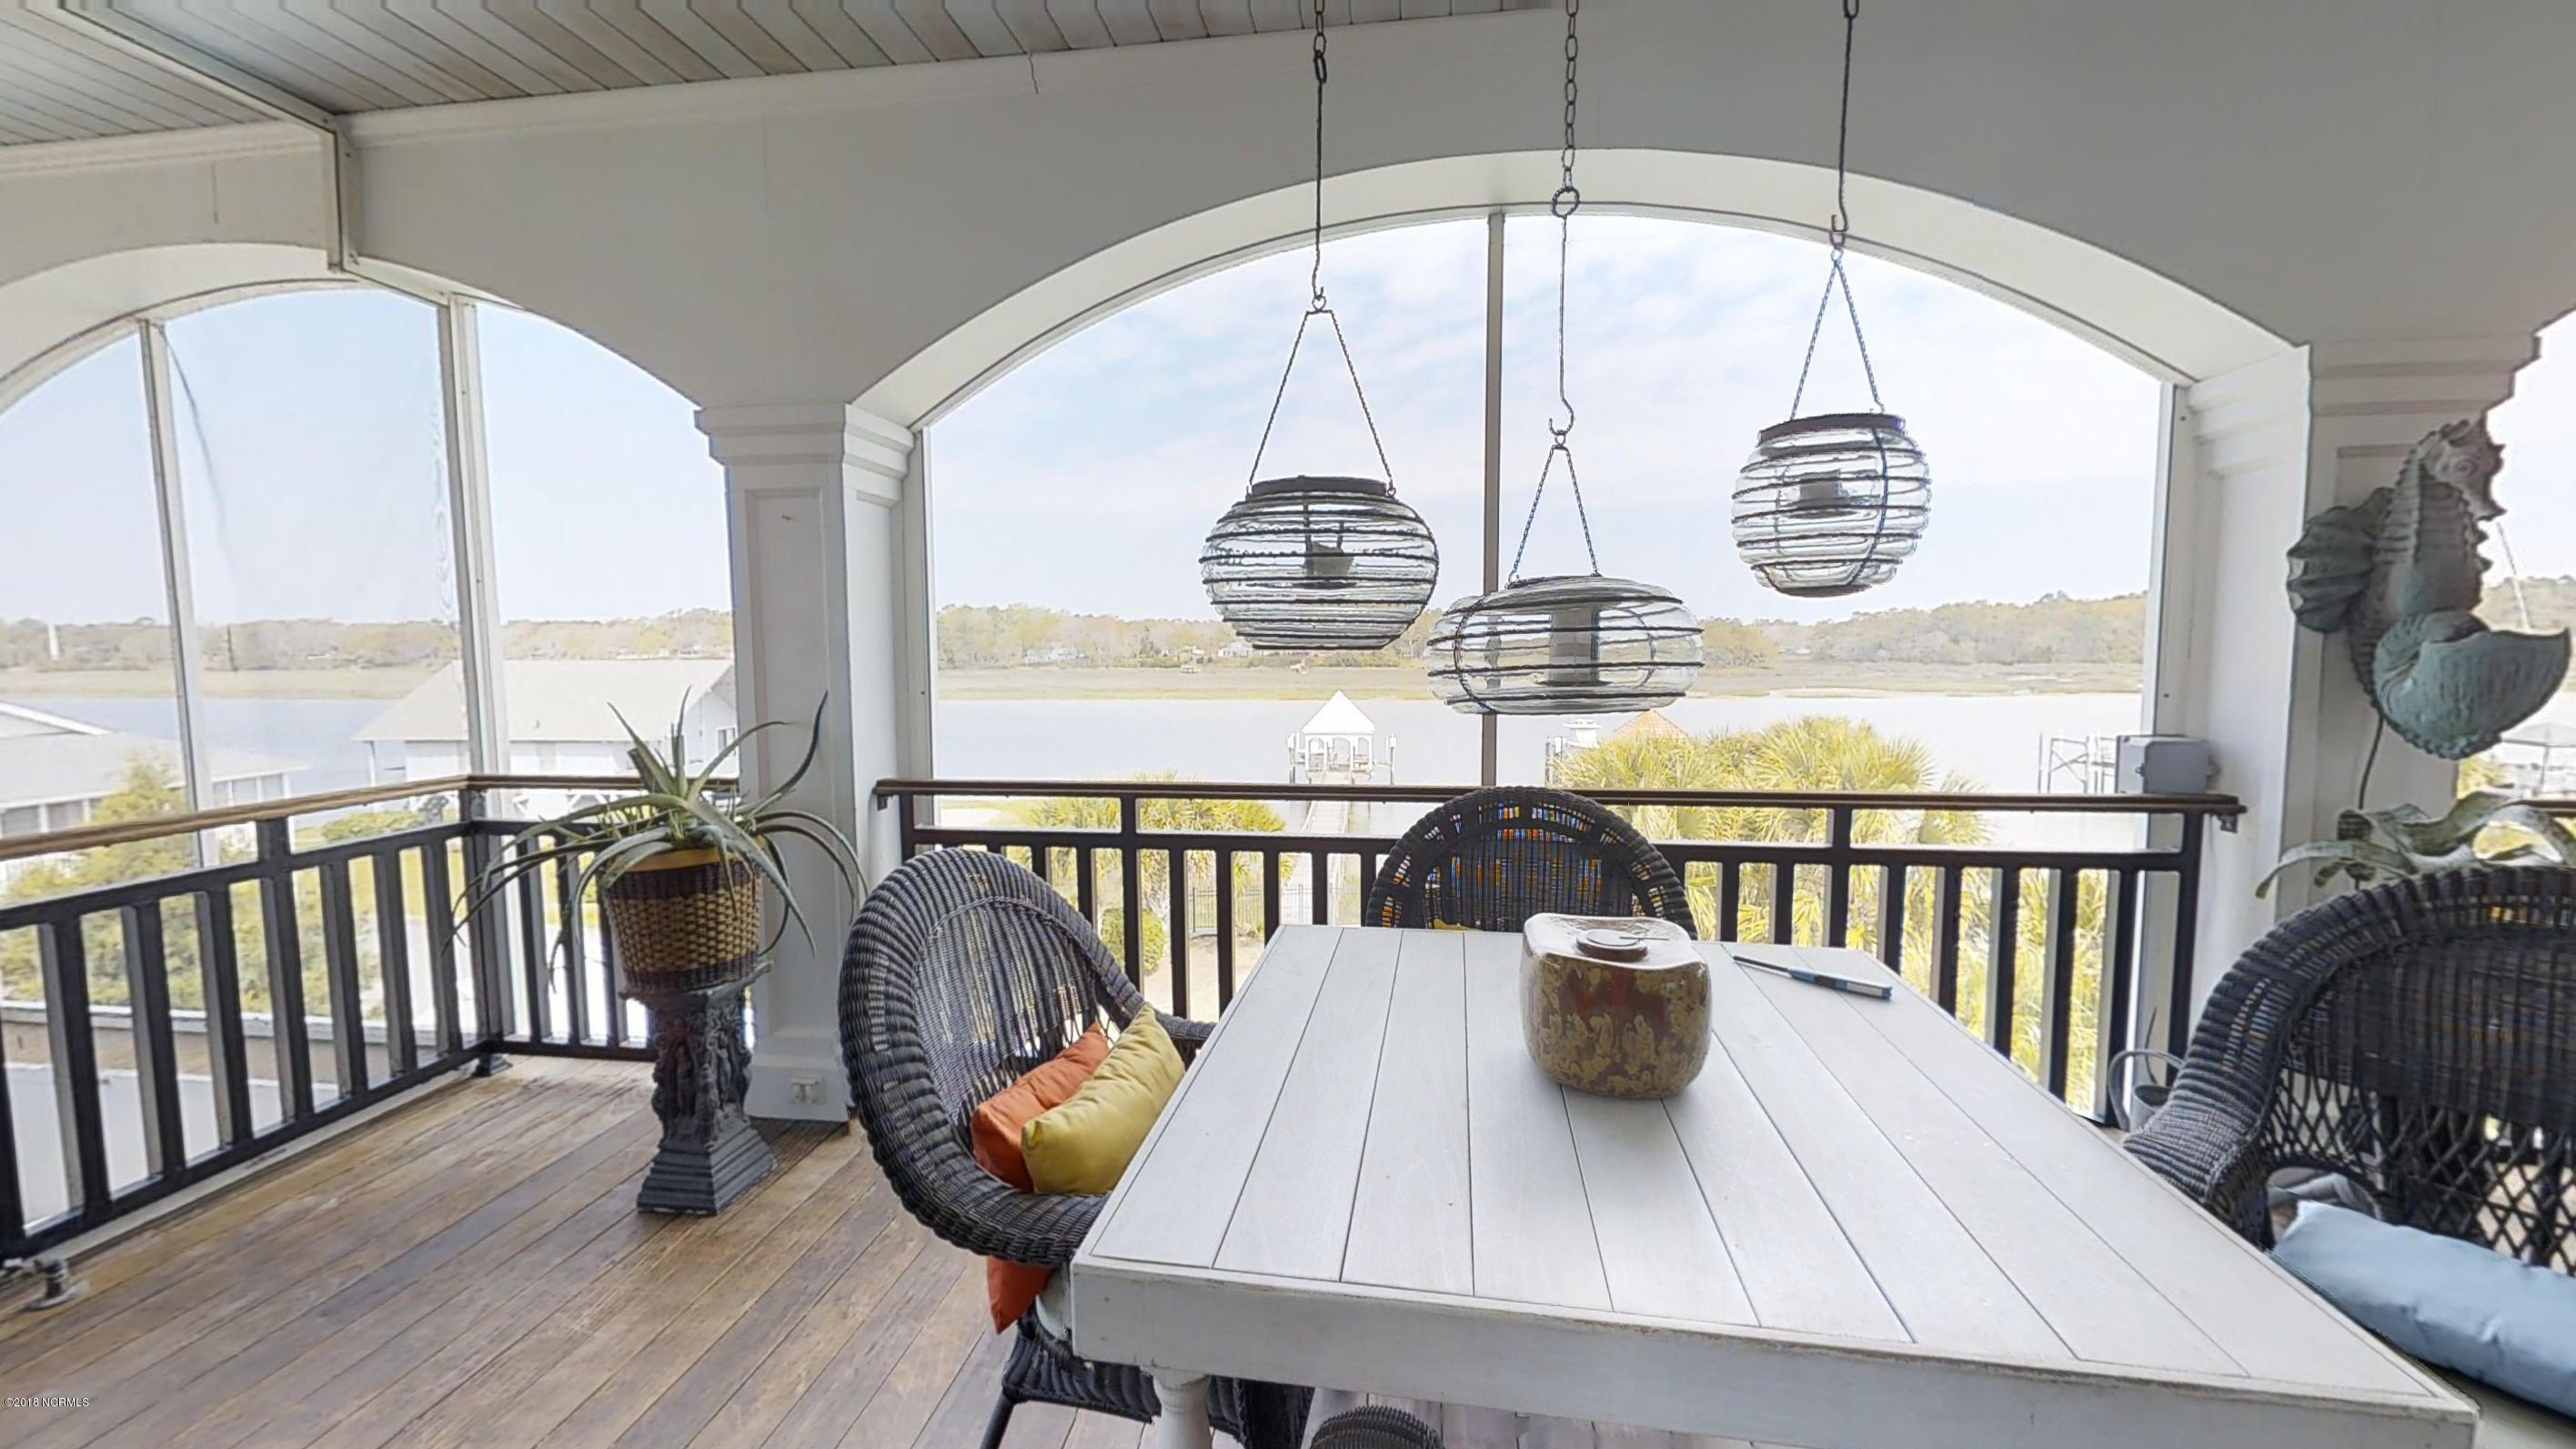 Ocean Isle Beach Real Estate - http://cdn.resize.sparkplatform.com/ncr/1024x768/true/20180414120134422534000000-o.jpg